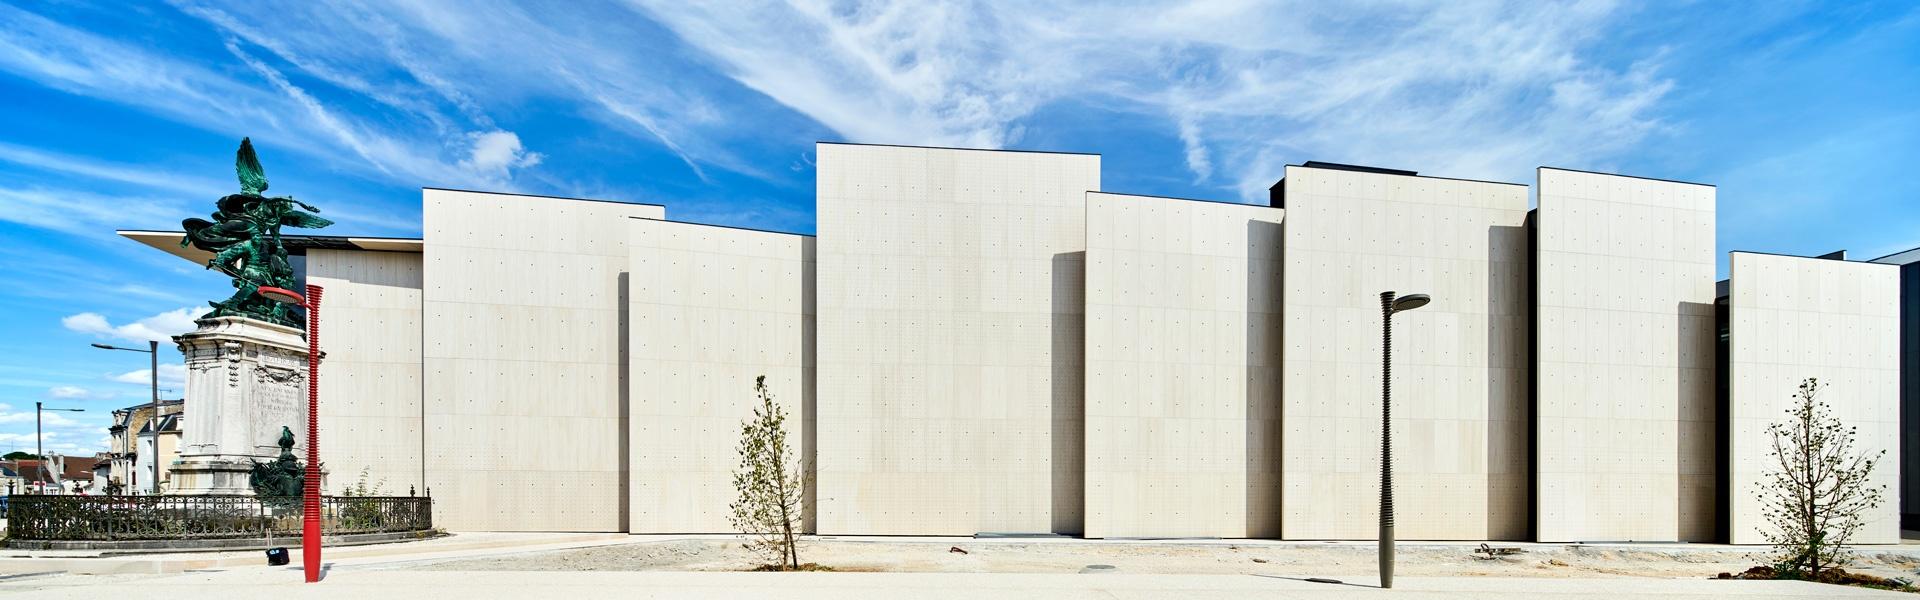 Inside Le Signe, France's new National Centre of Graphic Design